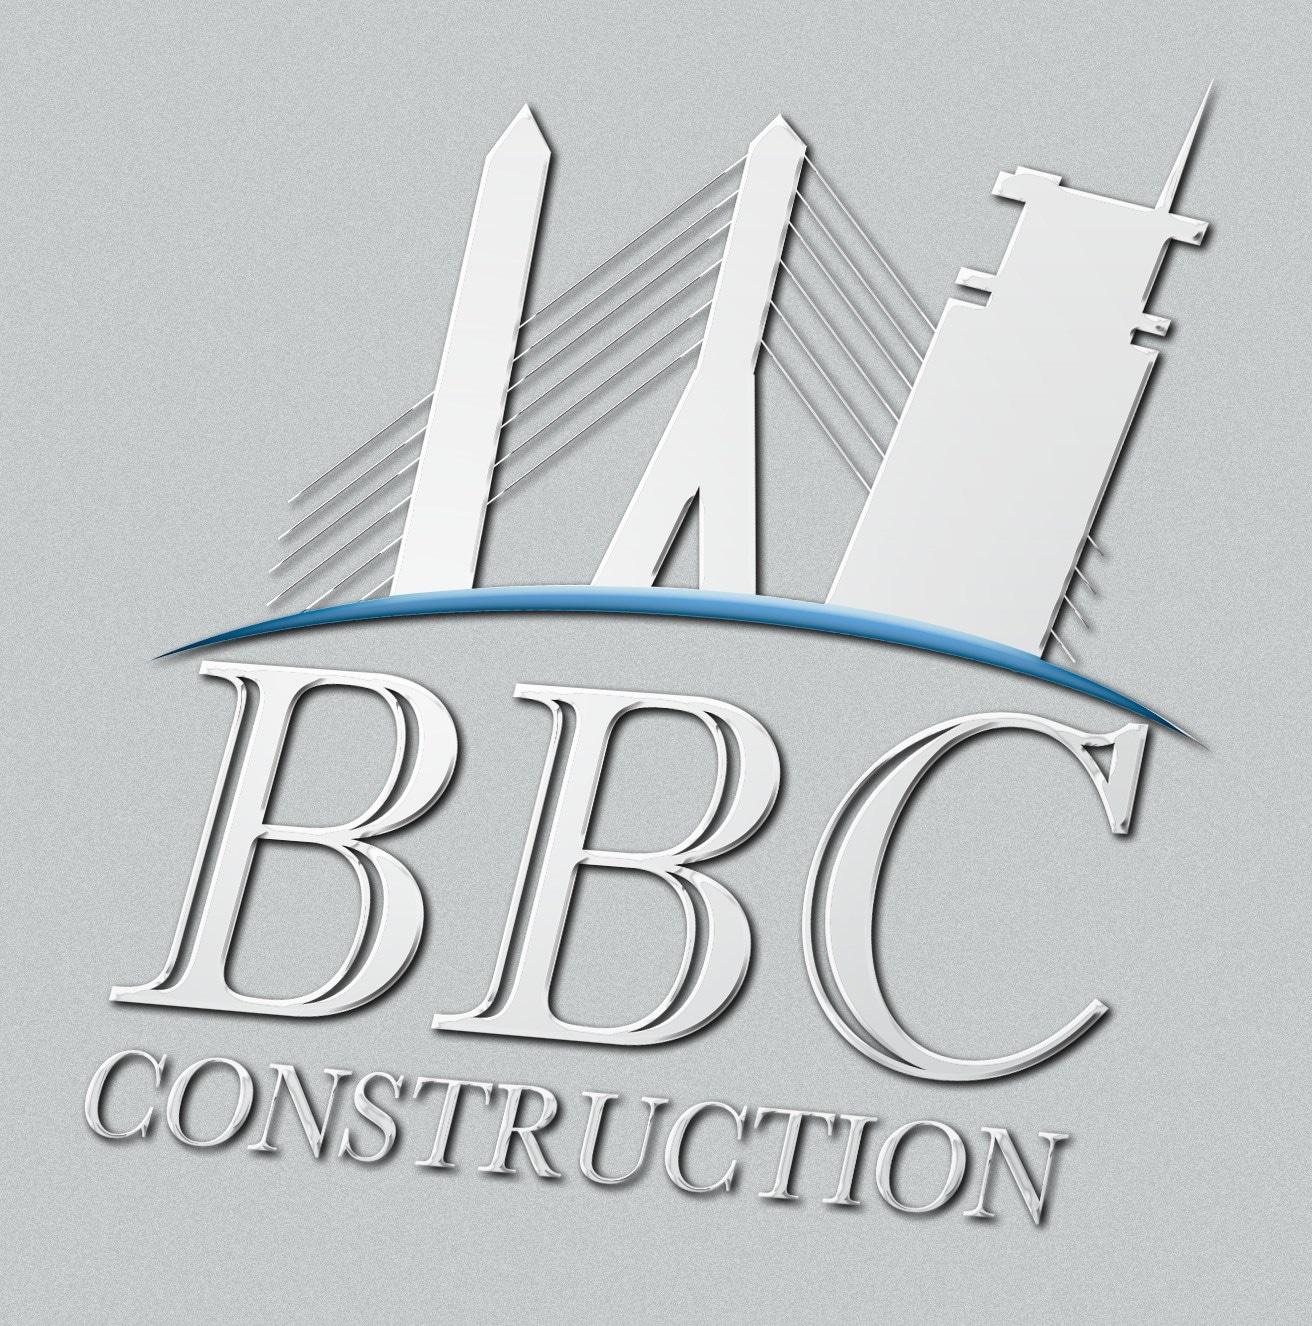 Boston Best Construction